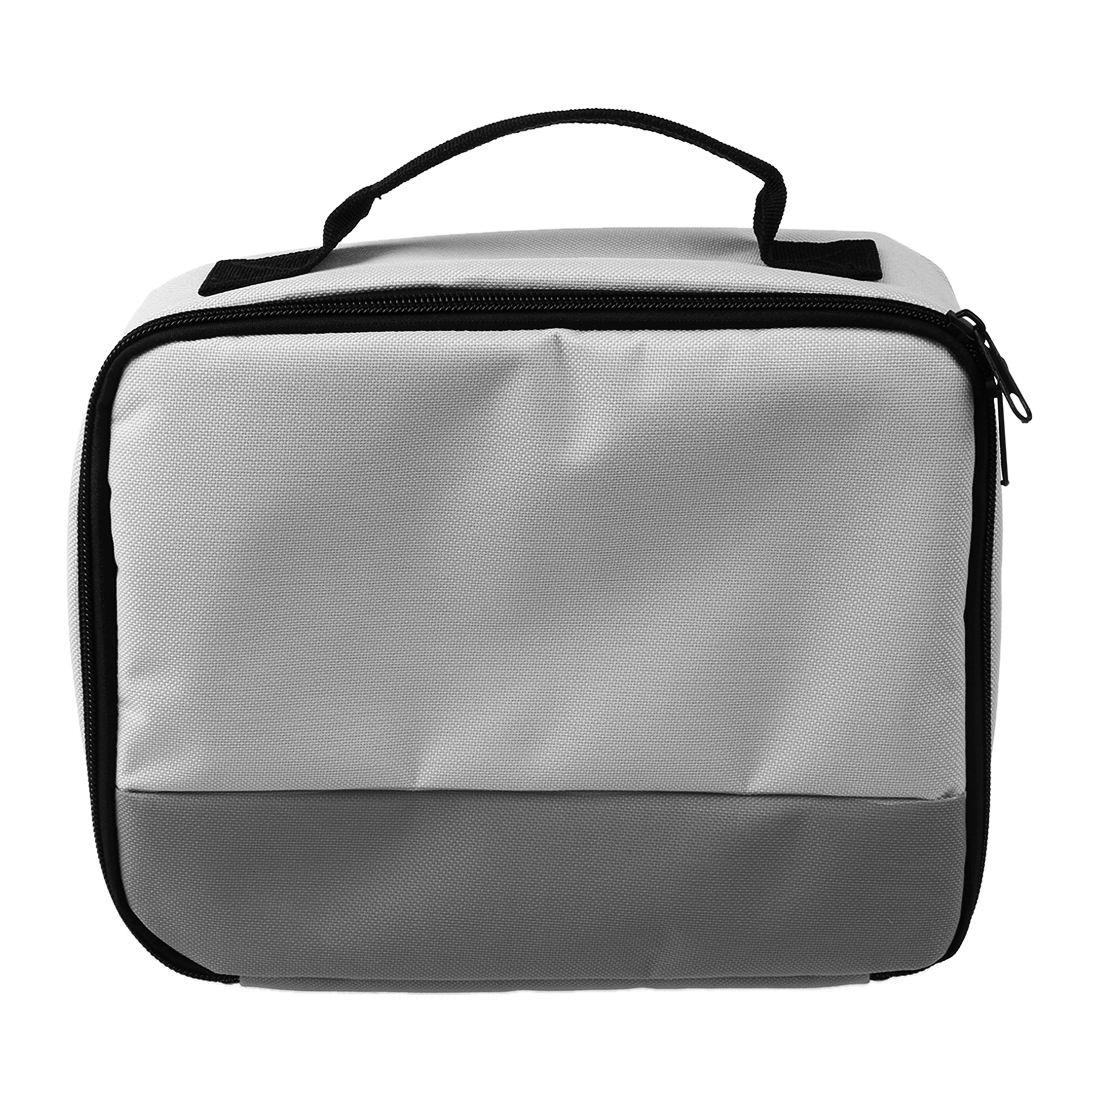 Poliéster de paquete de viaje bolsa caso para canon selphy cp900/910/1200 inteligente impresora de foto para móvil funda protectora bolsa (gra